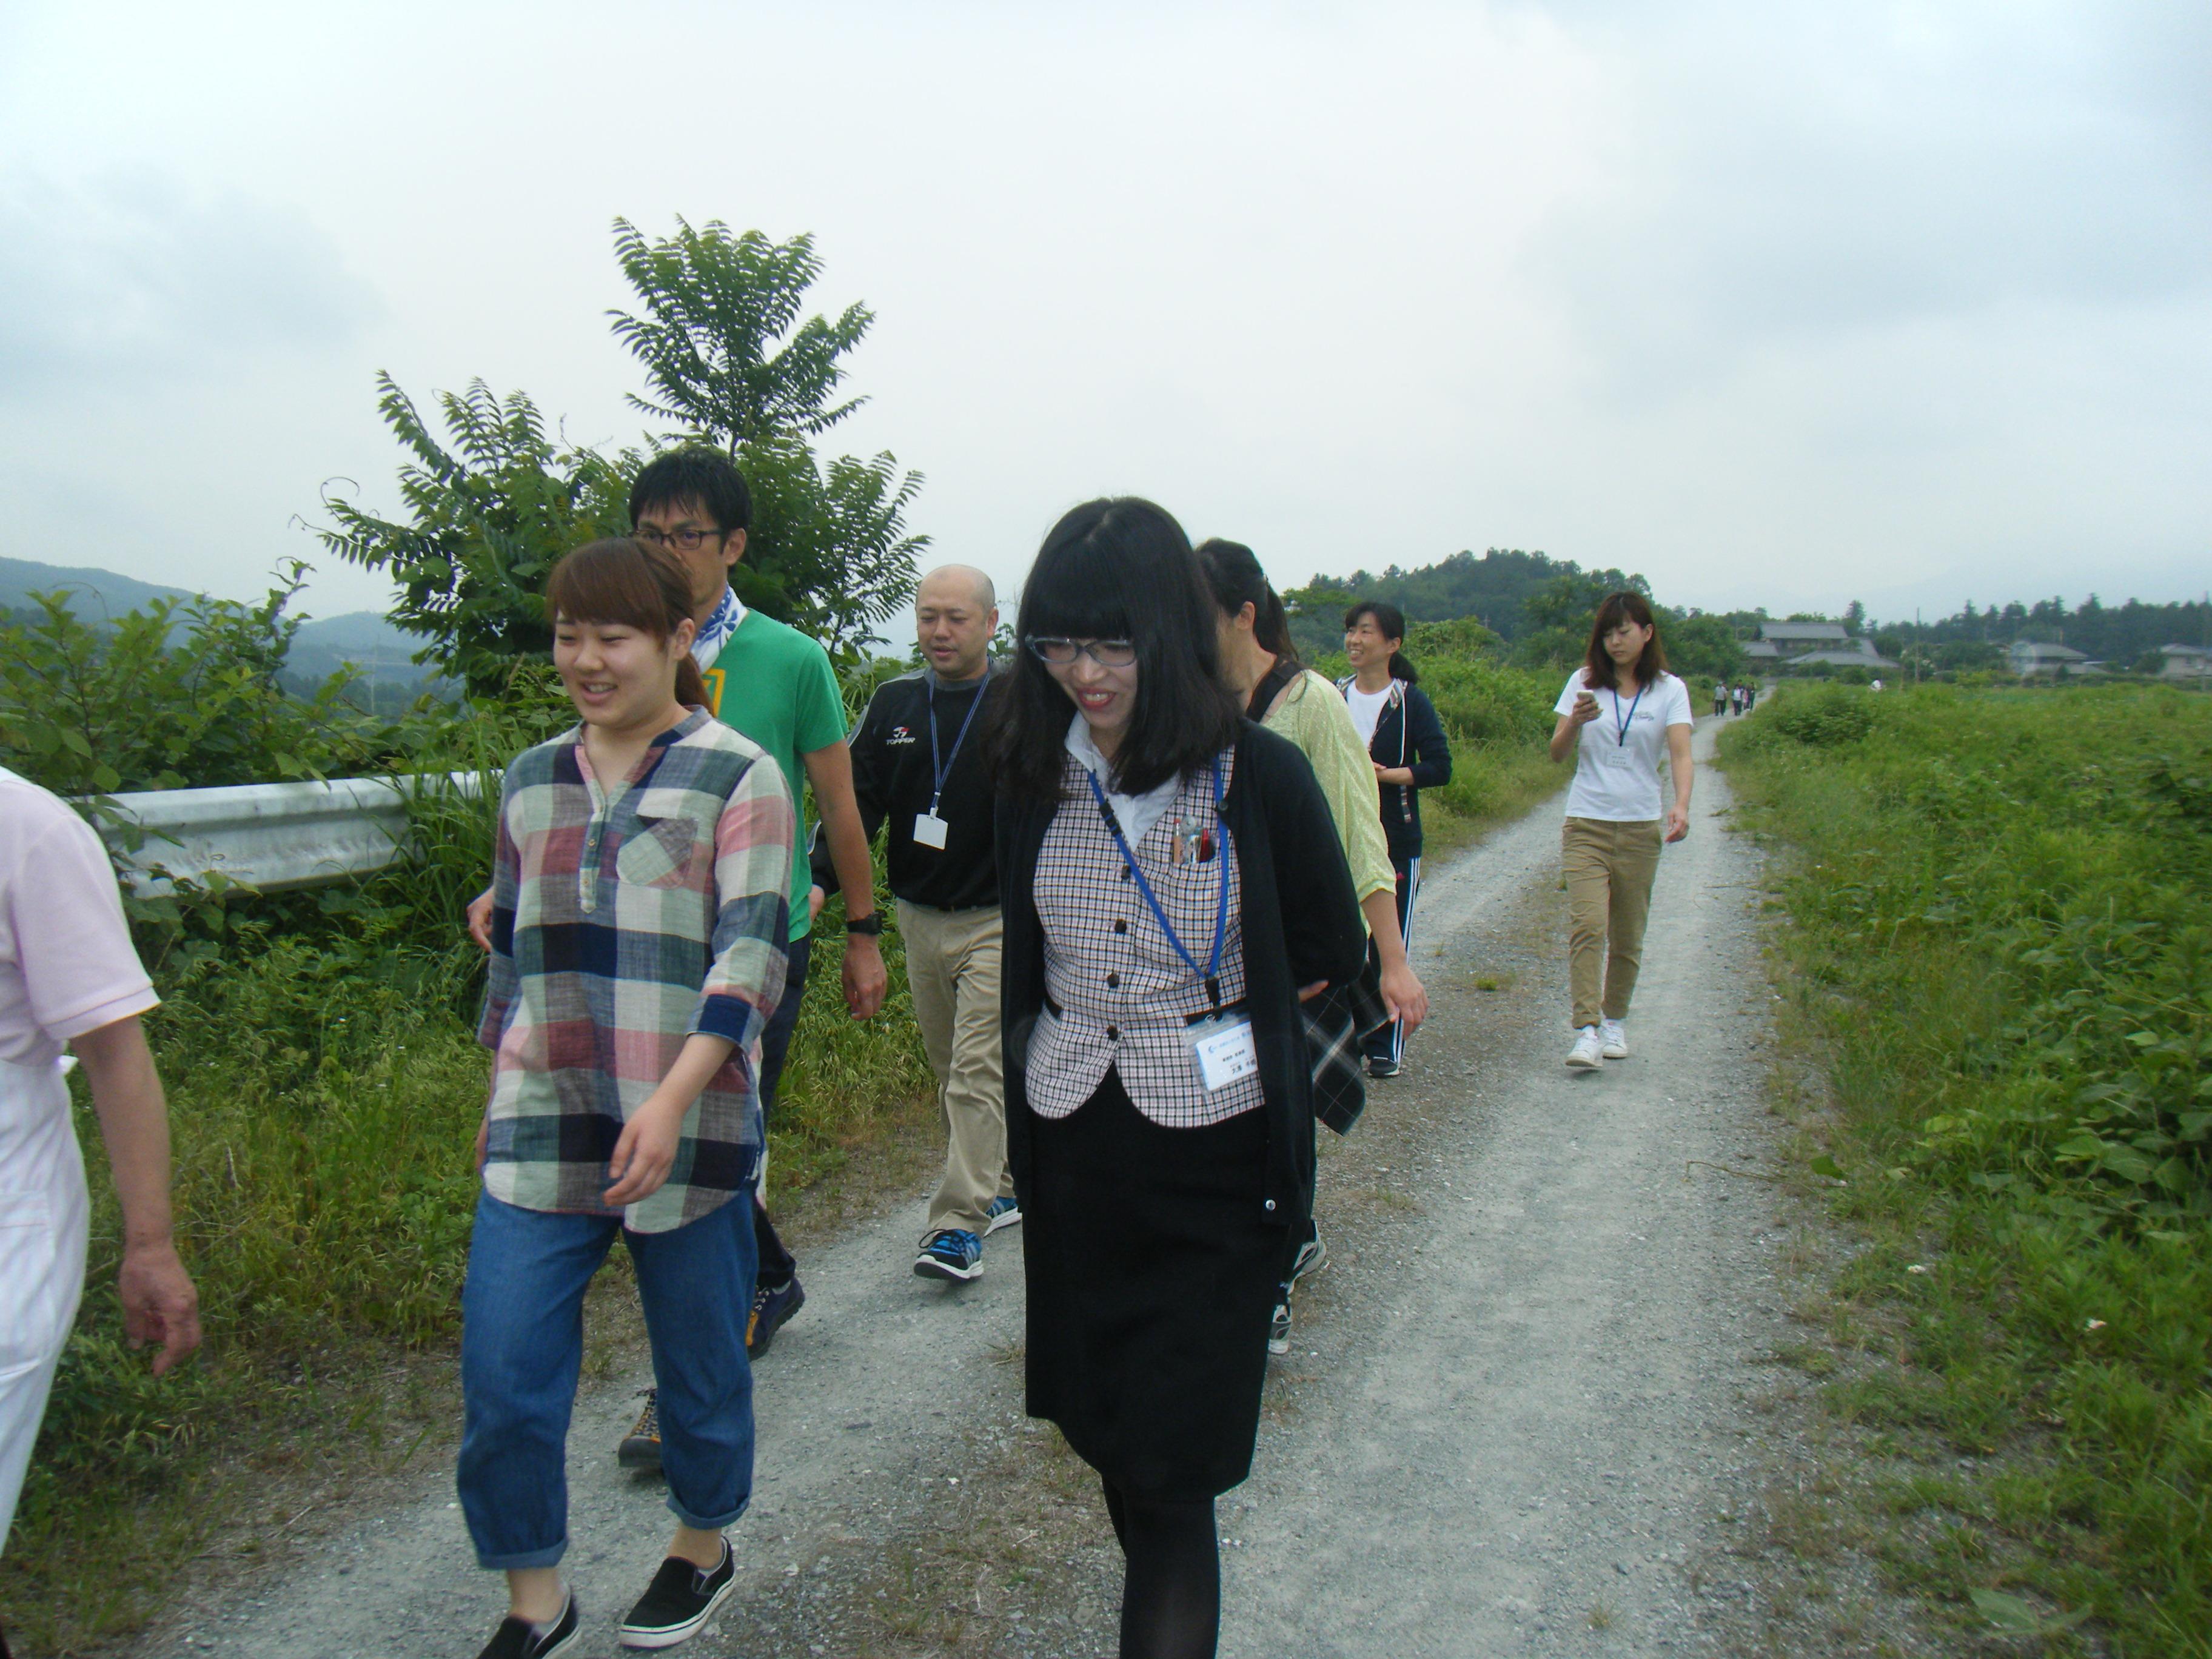 http://chichibu-med.jp/ndblog/DSCF1372.JPG